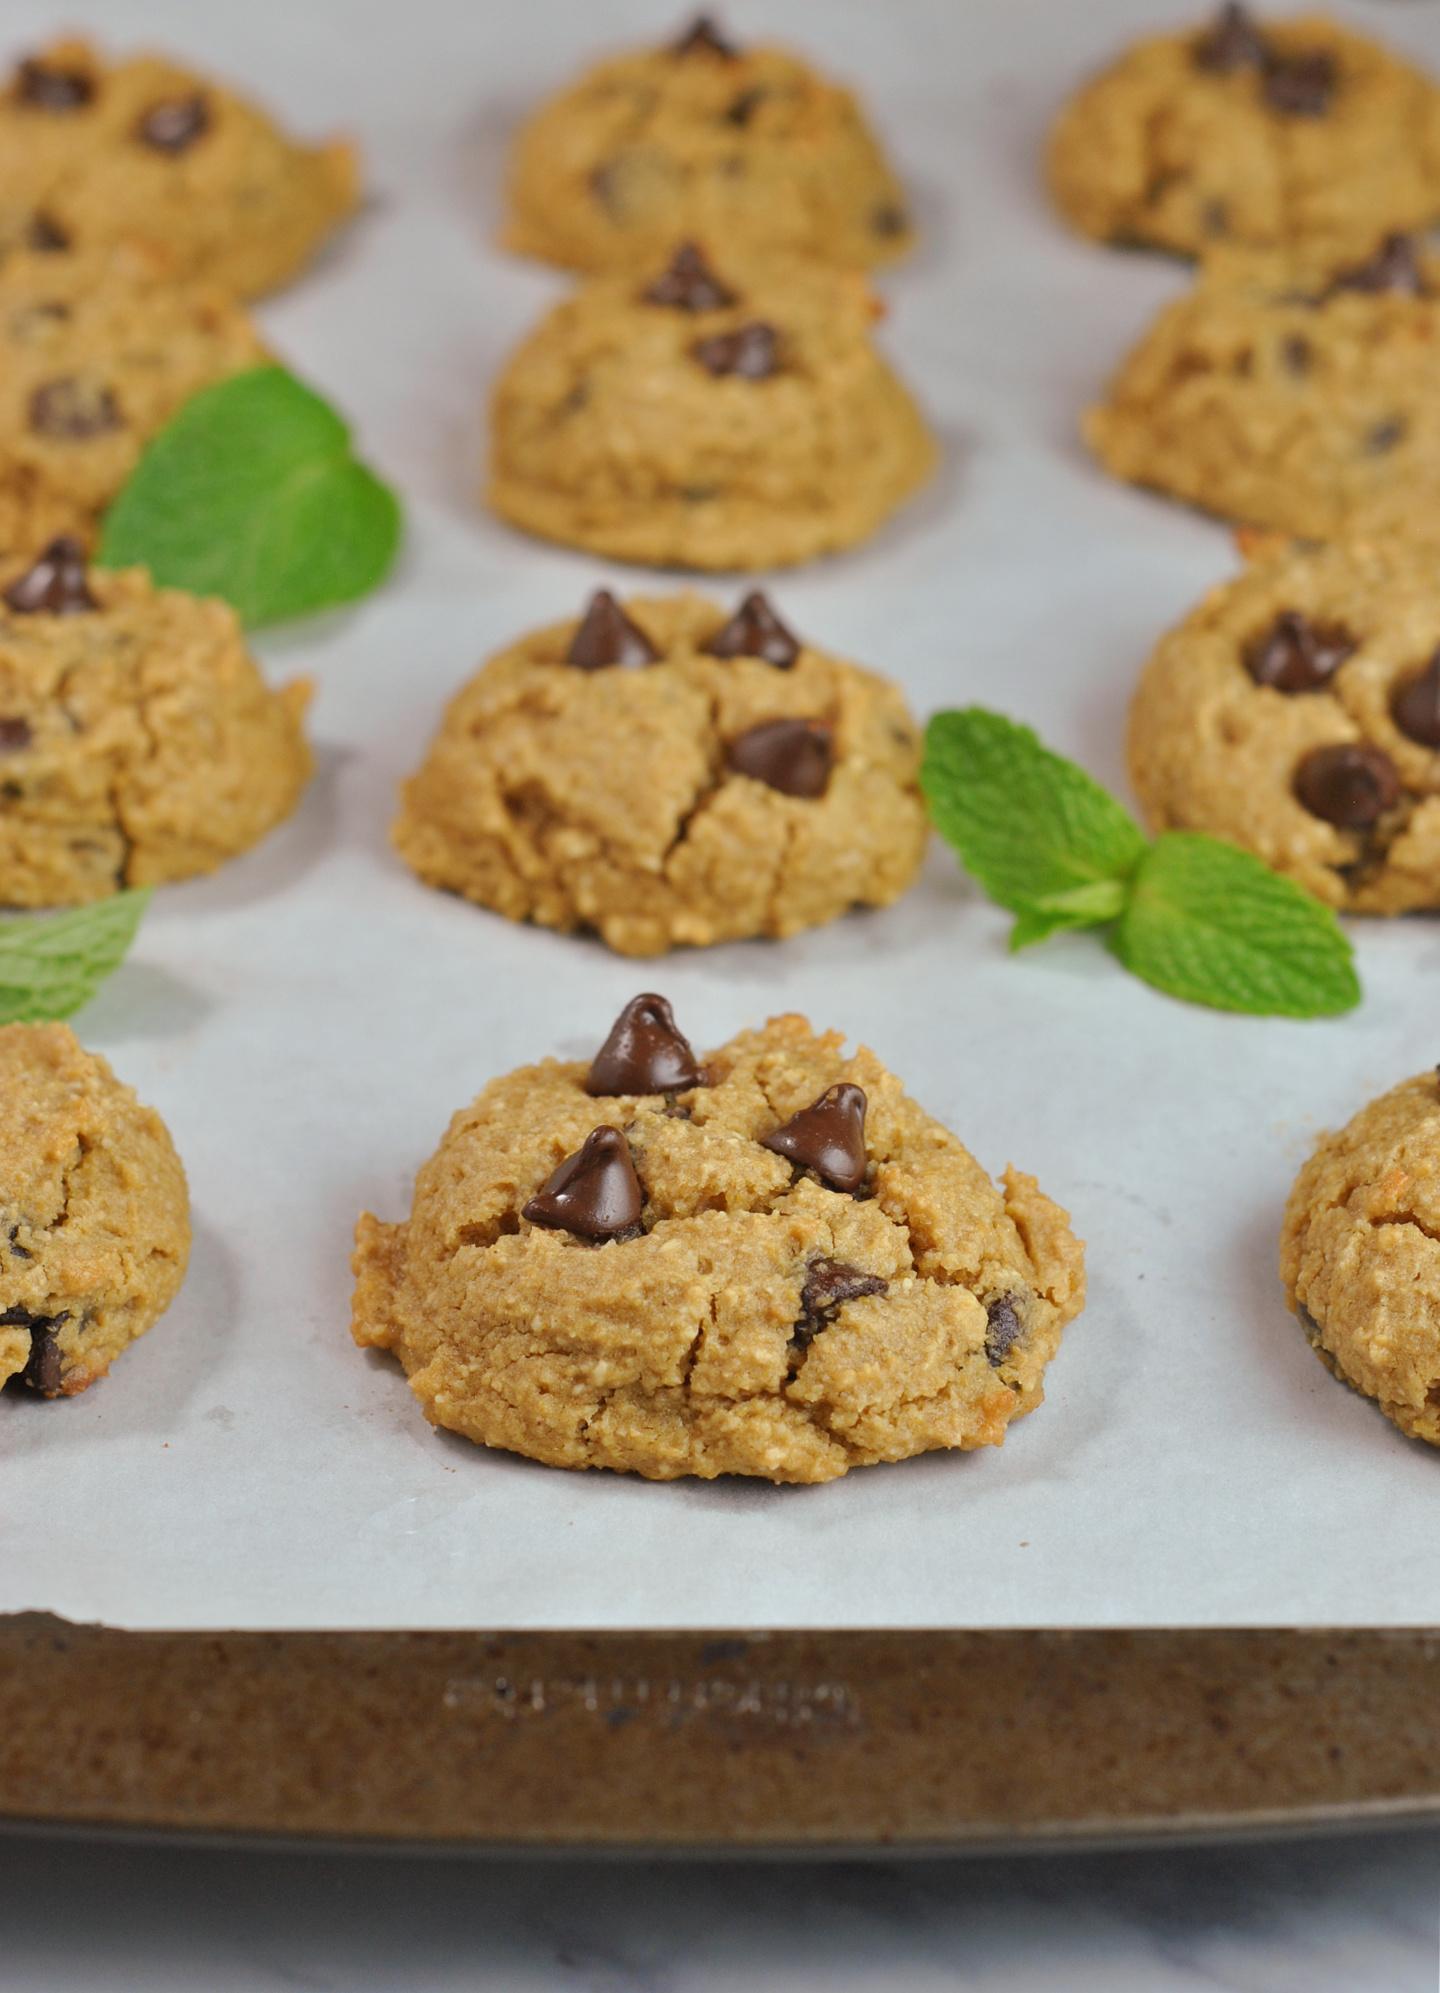 Chickpea Chocolate Chip Cookies via @preventionrd